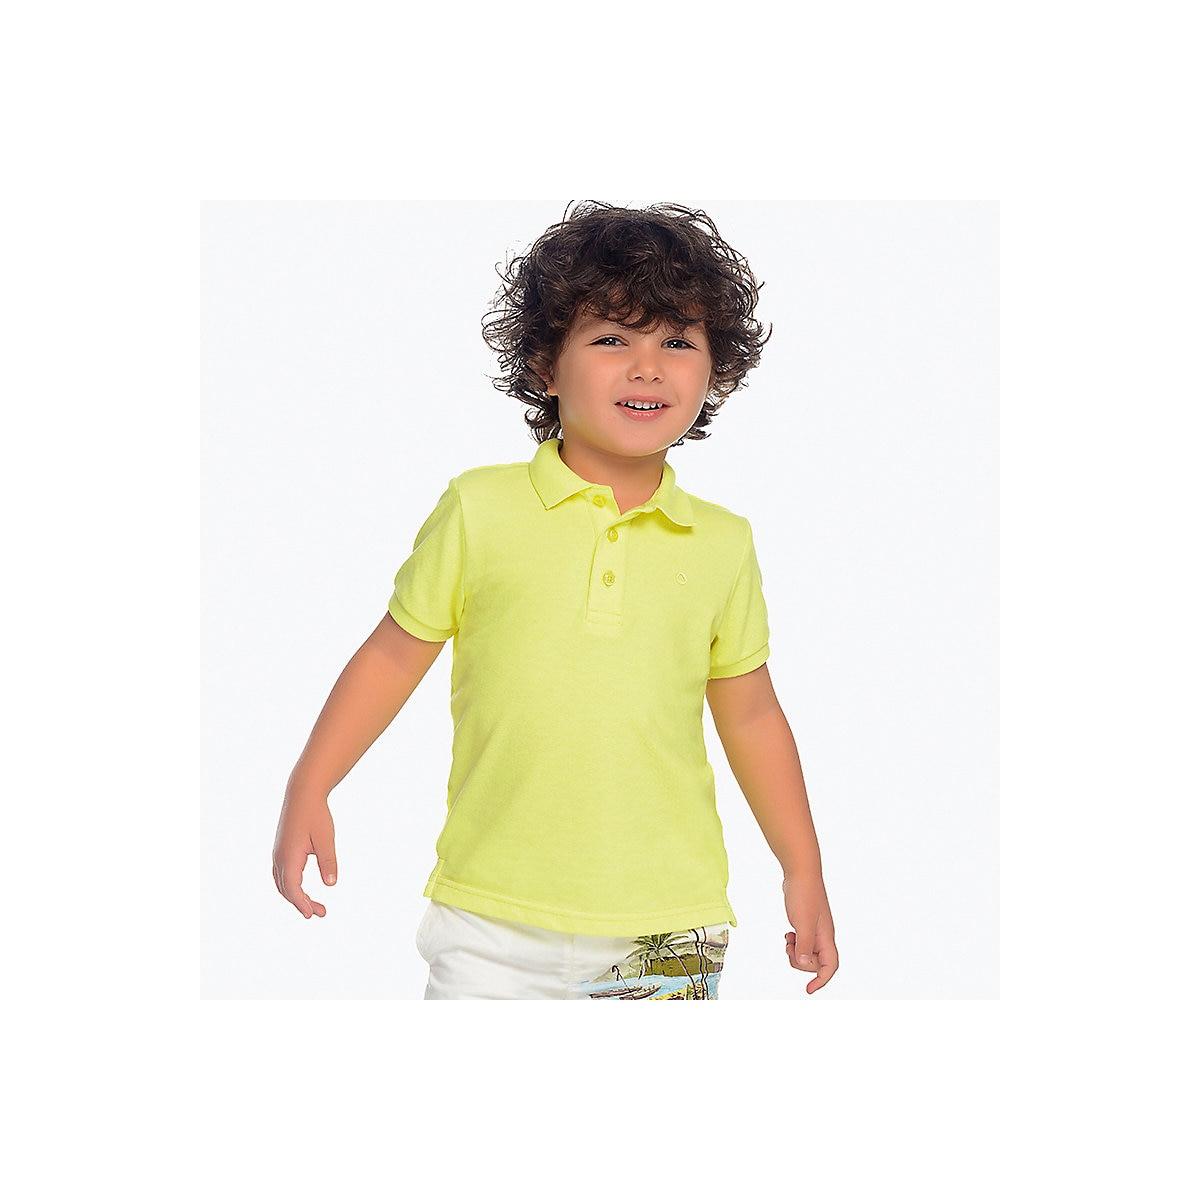 MAYORAL Polo Shirts 10683085 children clothing t-shirt shirt the print for boys